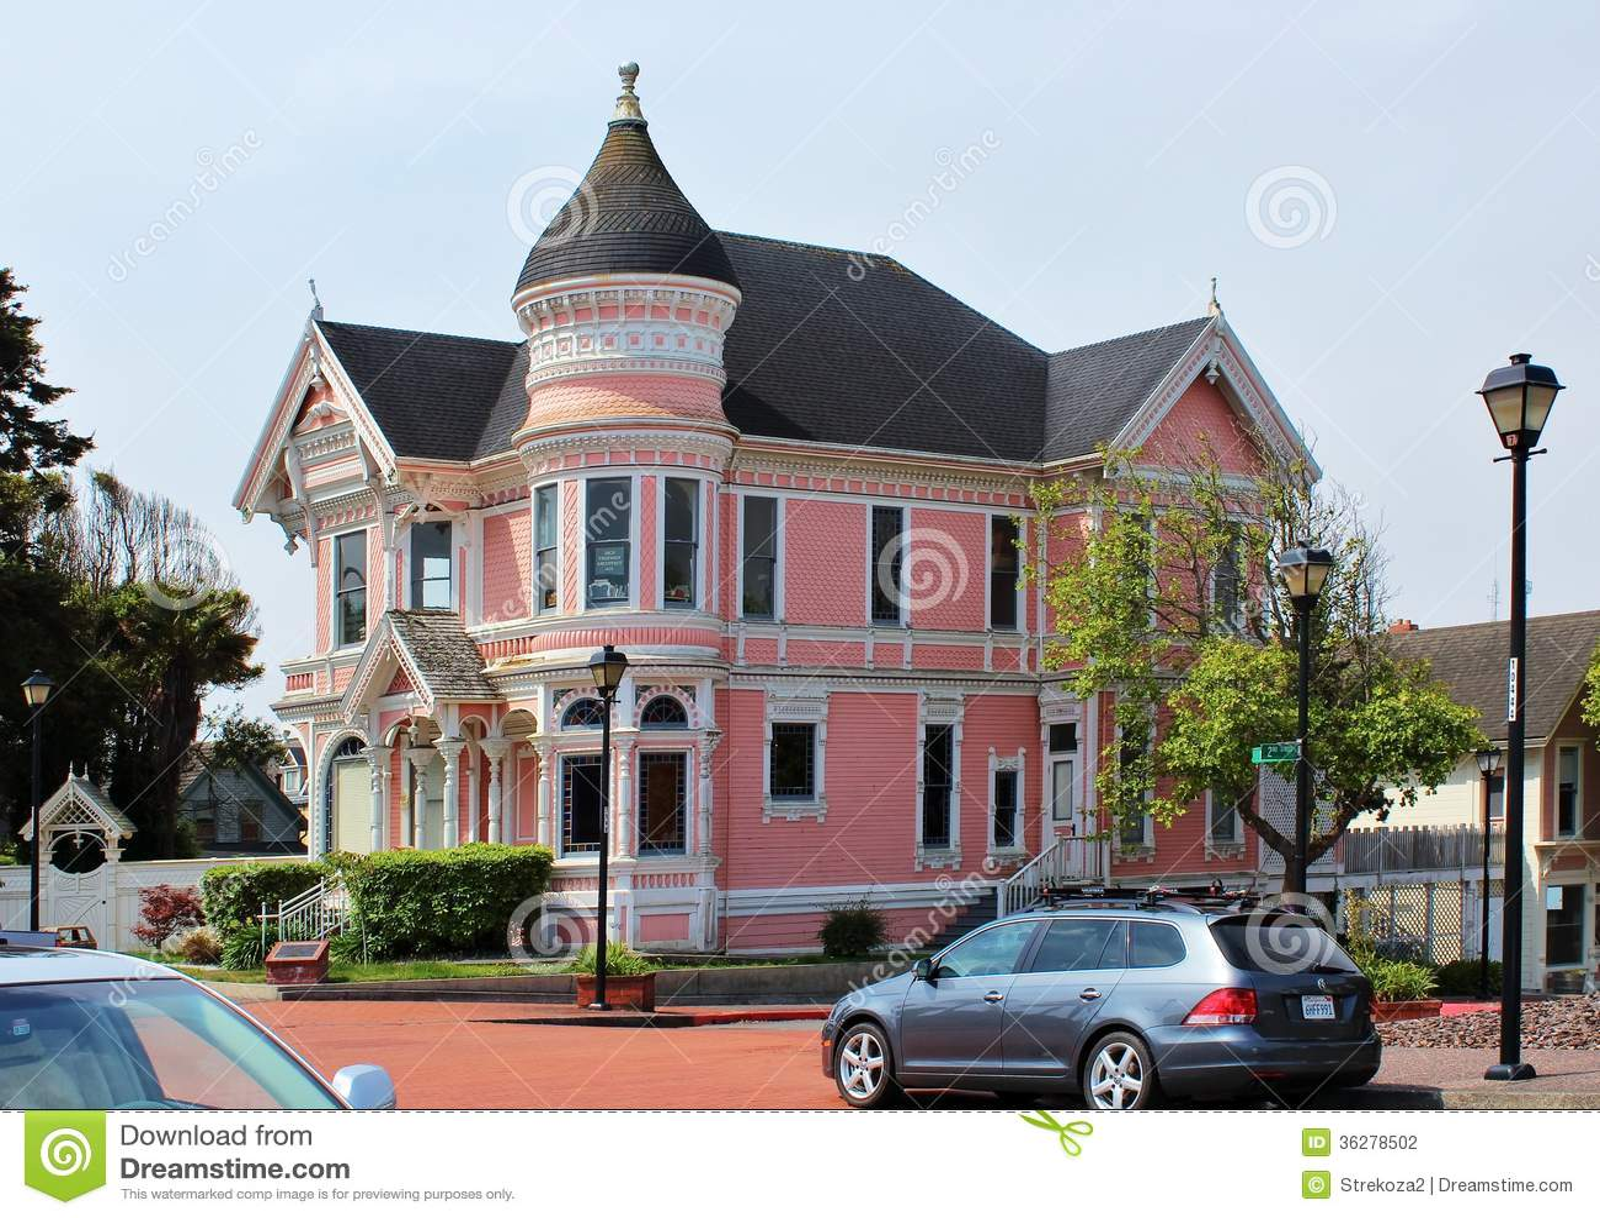 Pink lady house in eureka california editorial for Eureka house